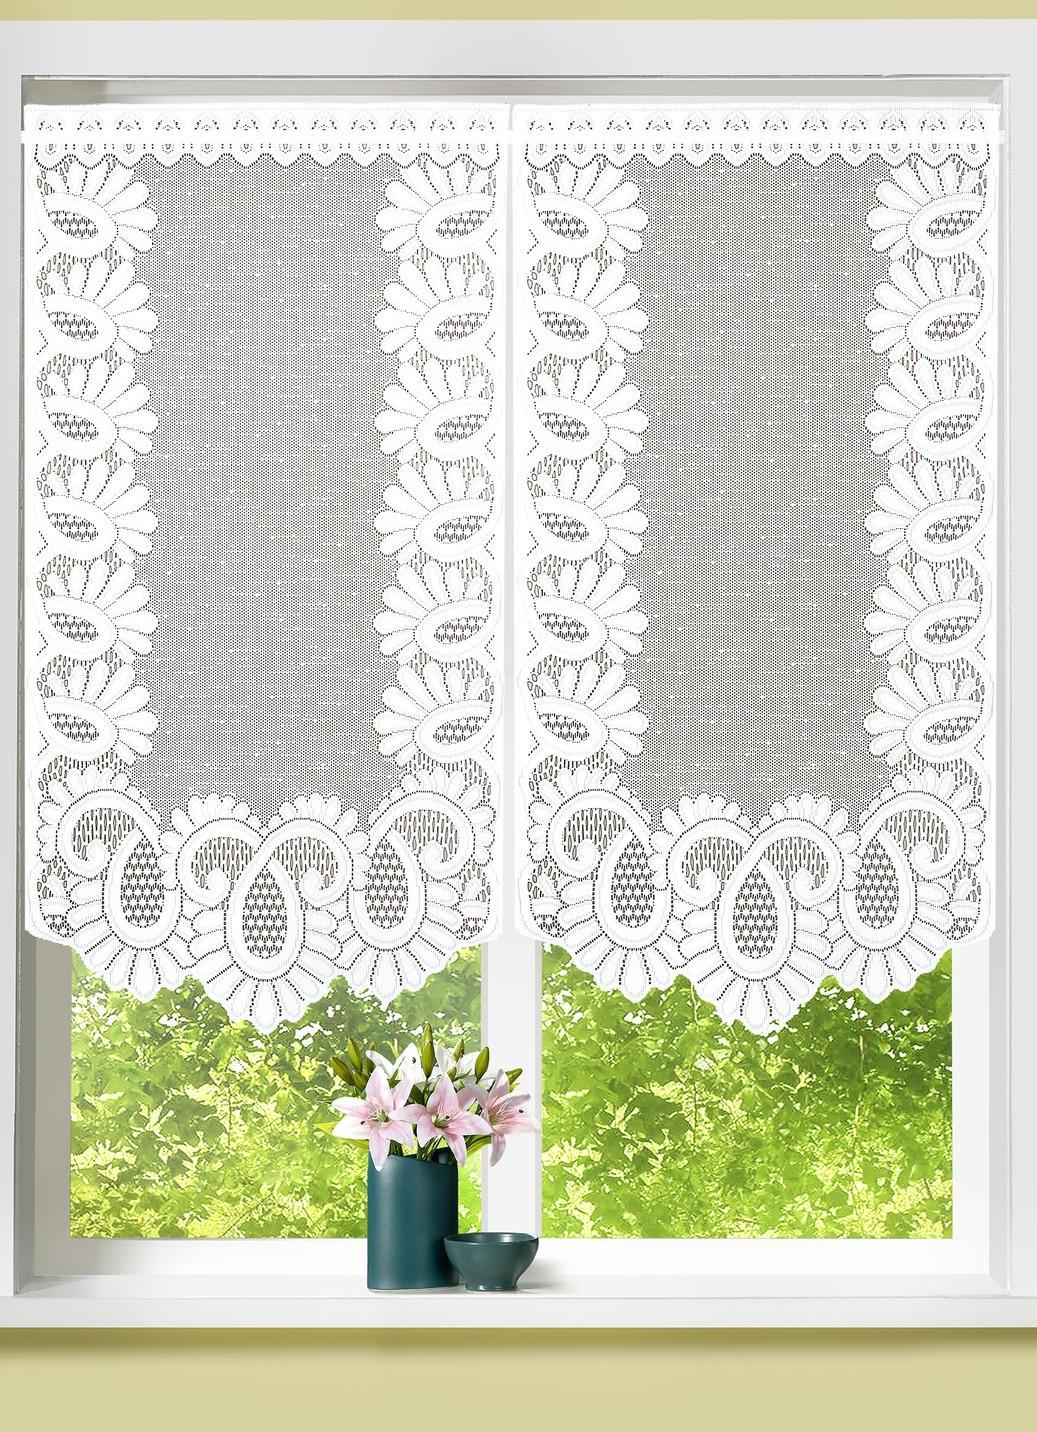 Fenster- oder Türbehang aus Jacquard, Größe 309 (Fensterbehang, 2er-Set H 80xB40 cm), Weiss